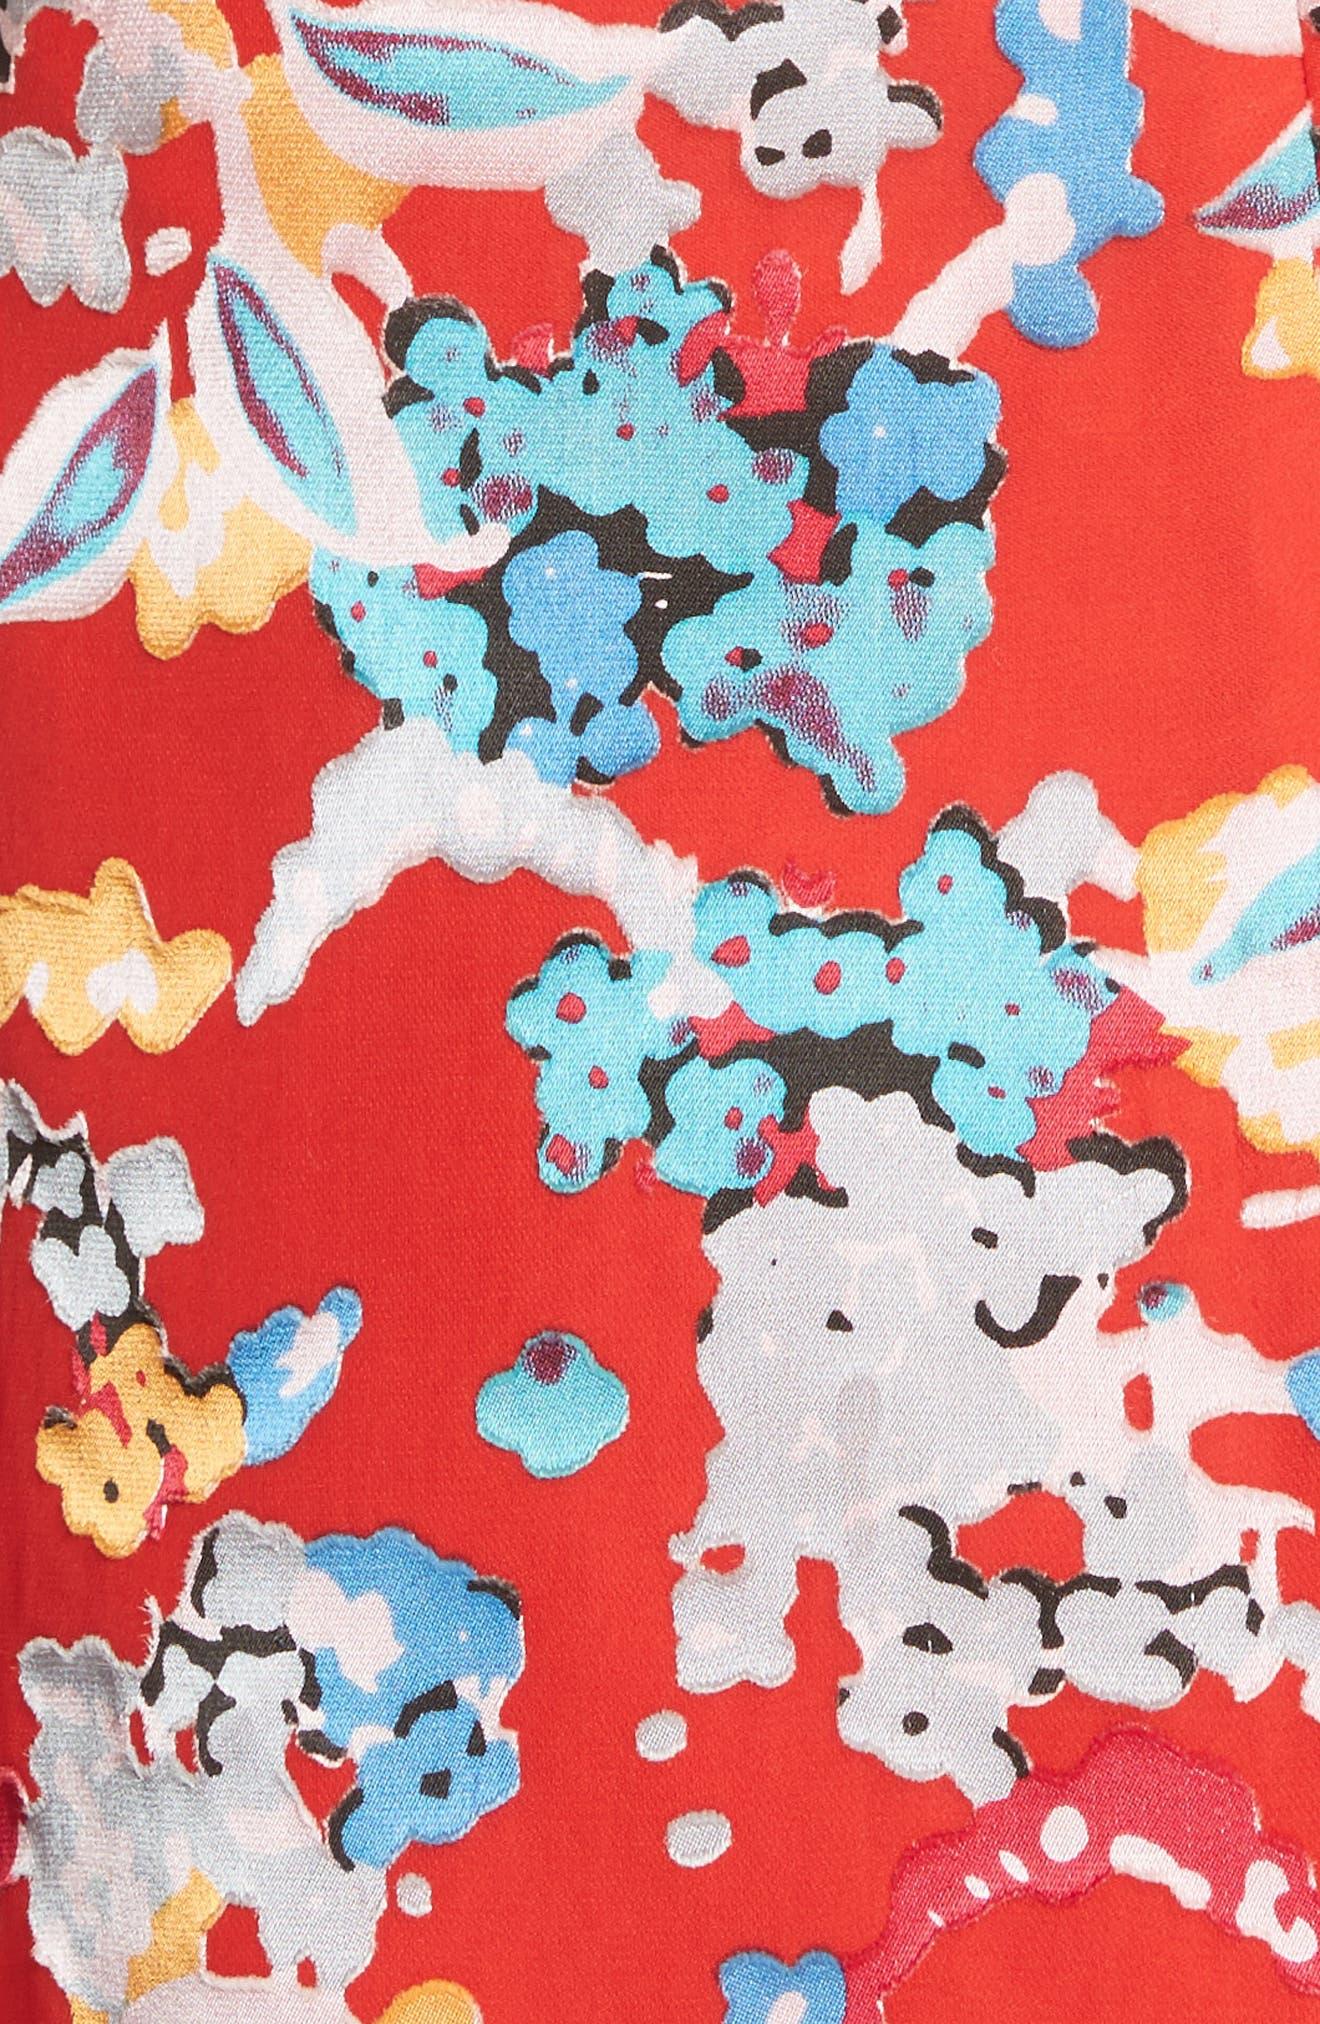 Cece Floral Print Ruffle Trim Dress,                             Alternate thumbnail 5, color,                             Coral Begonia